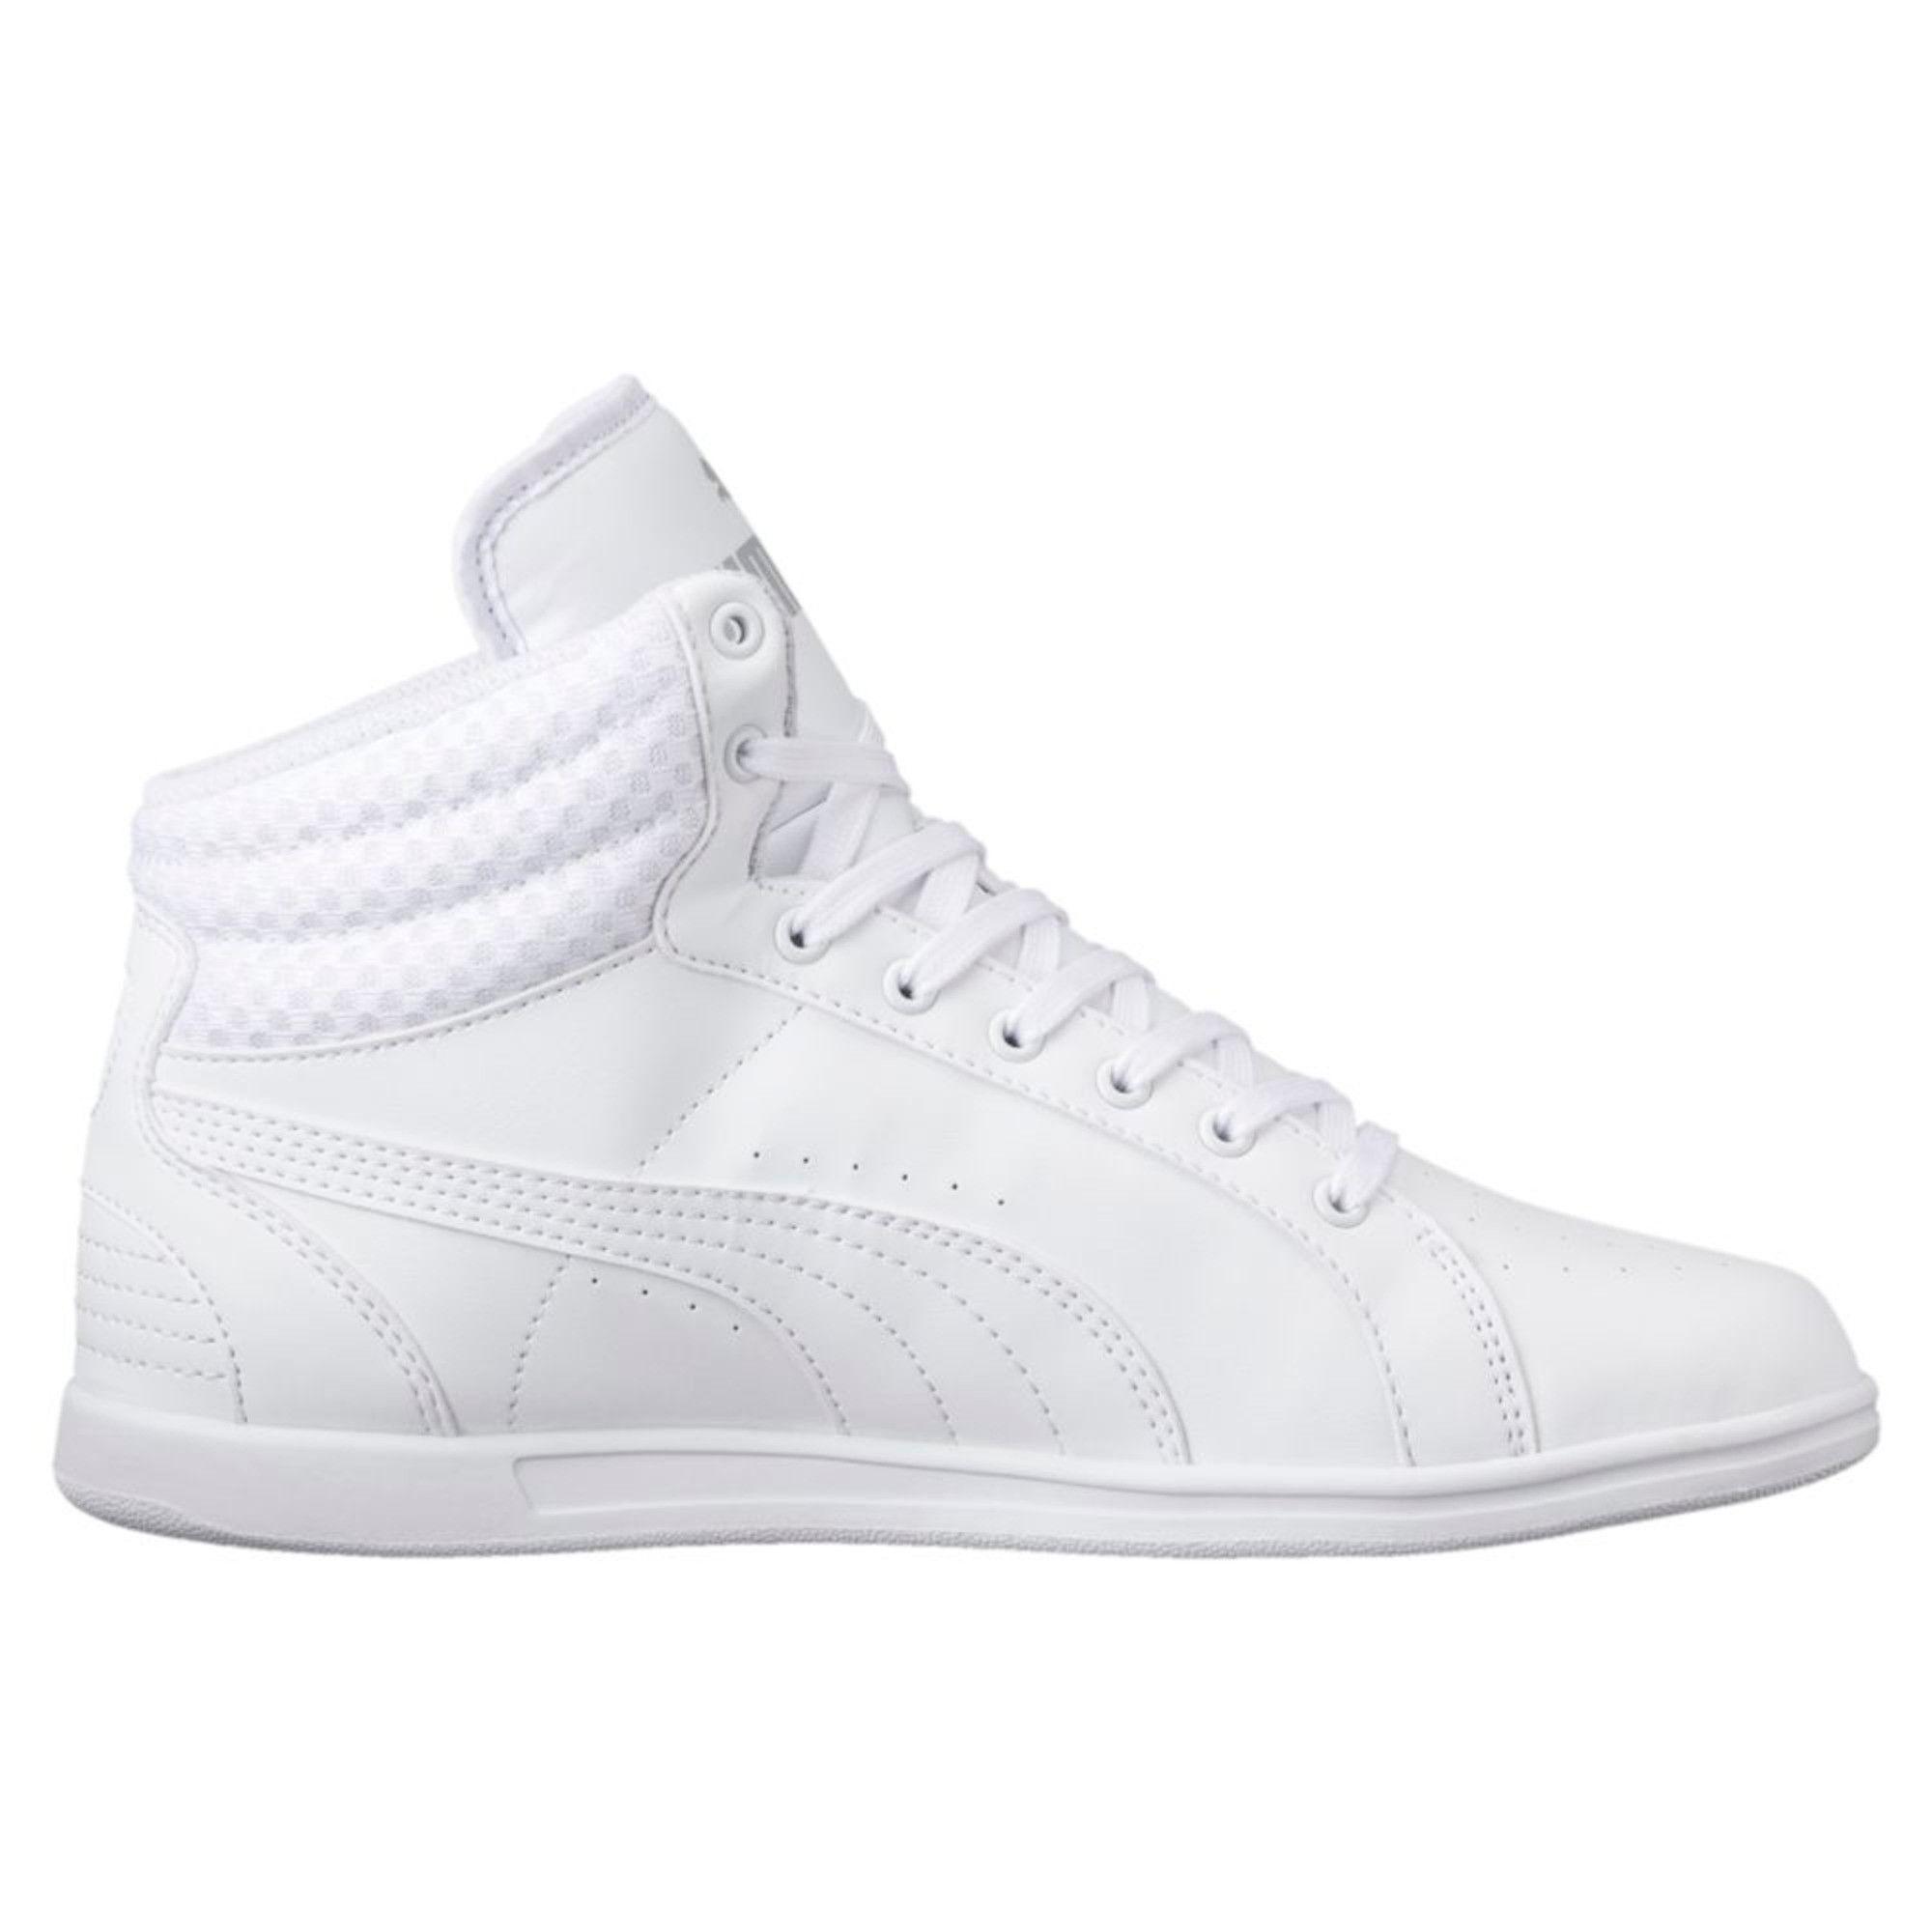 Puma Ikaz Mid V2 Women's White Sneakers